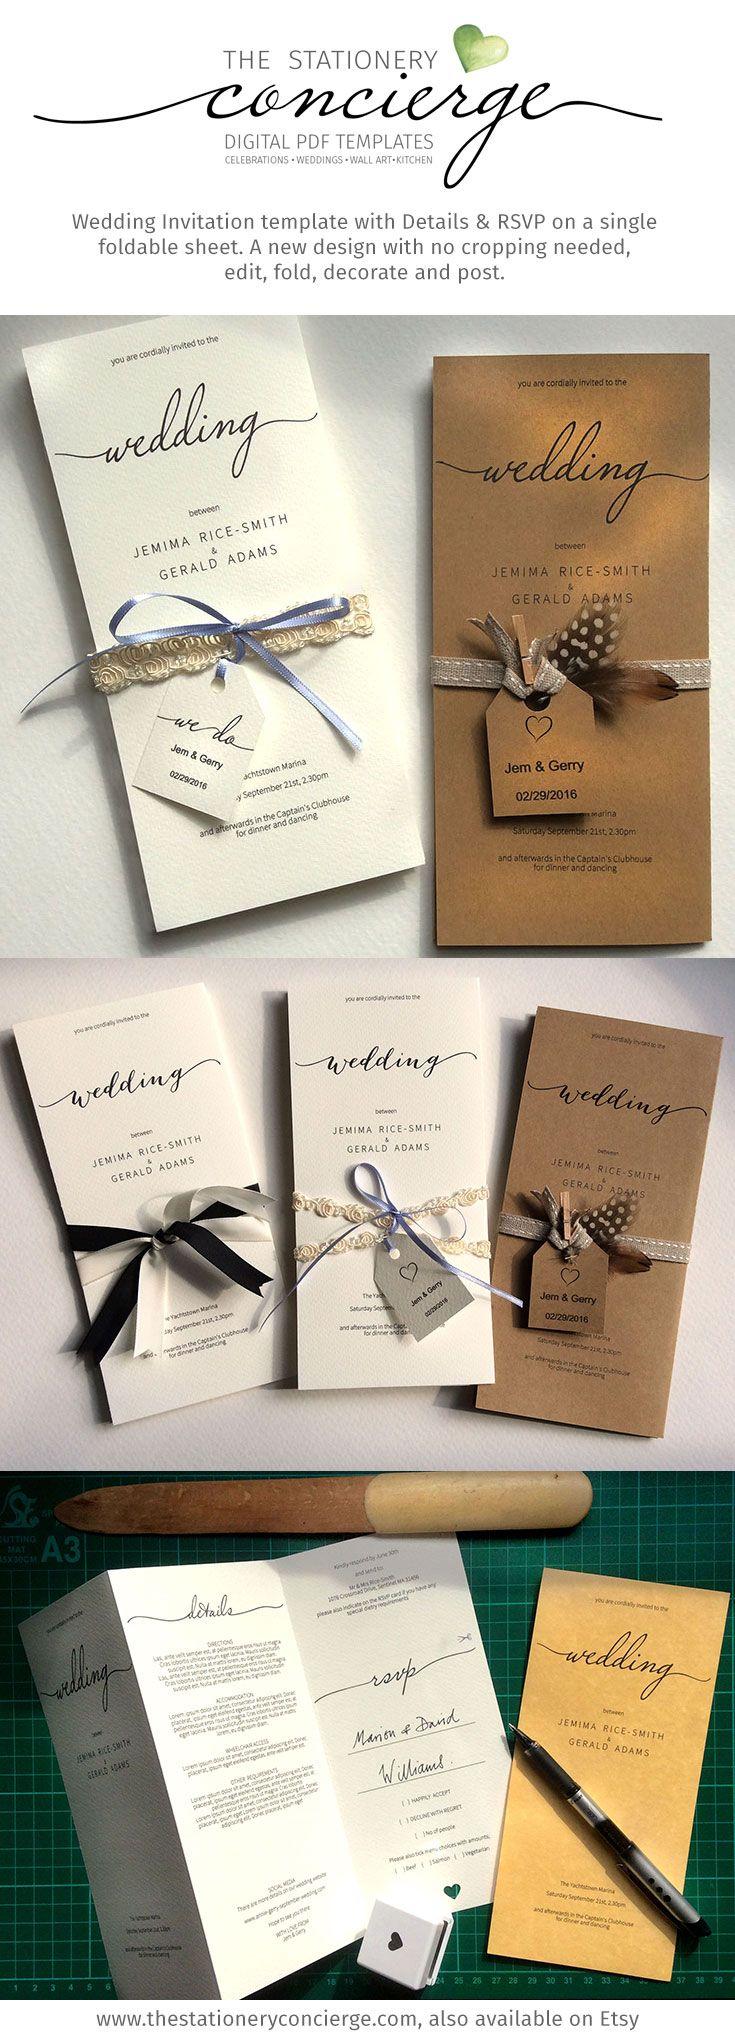 Printable Wedding Invitation One sheet wedding invitation